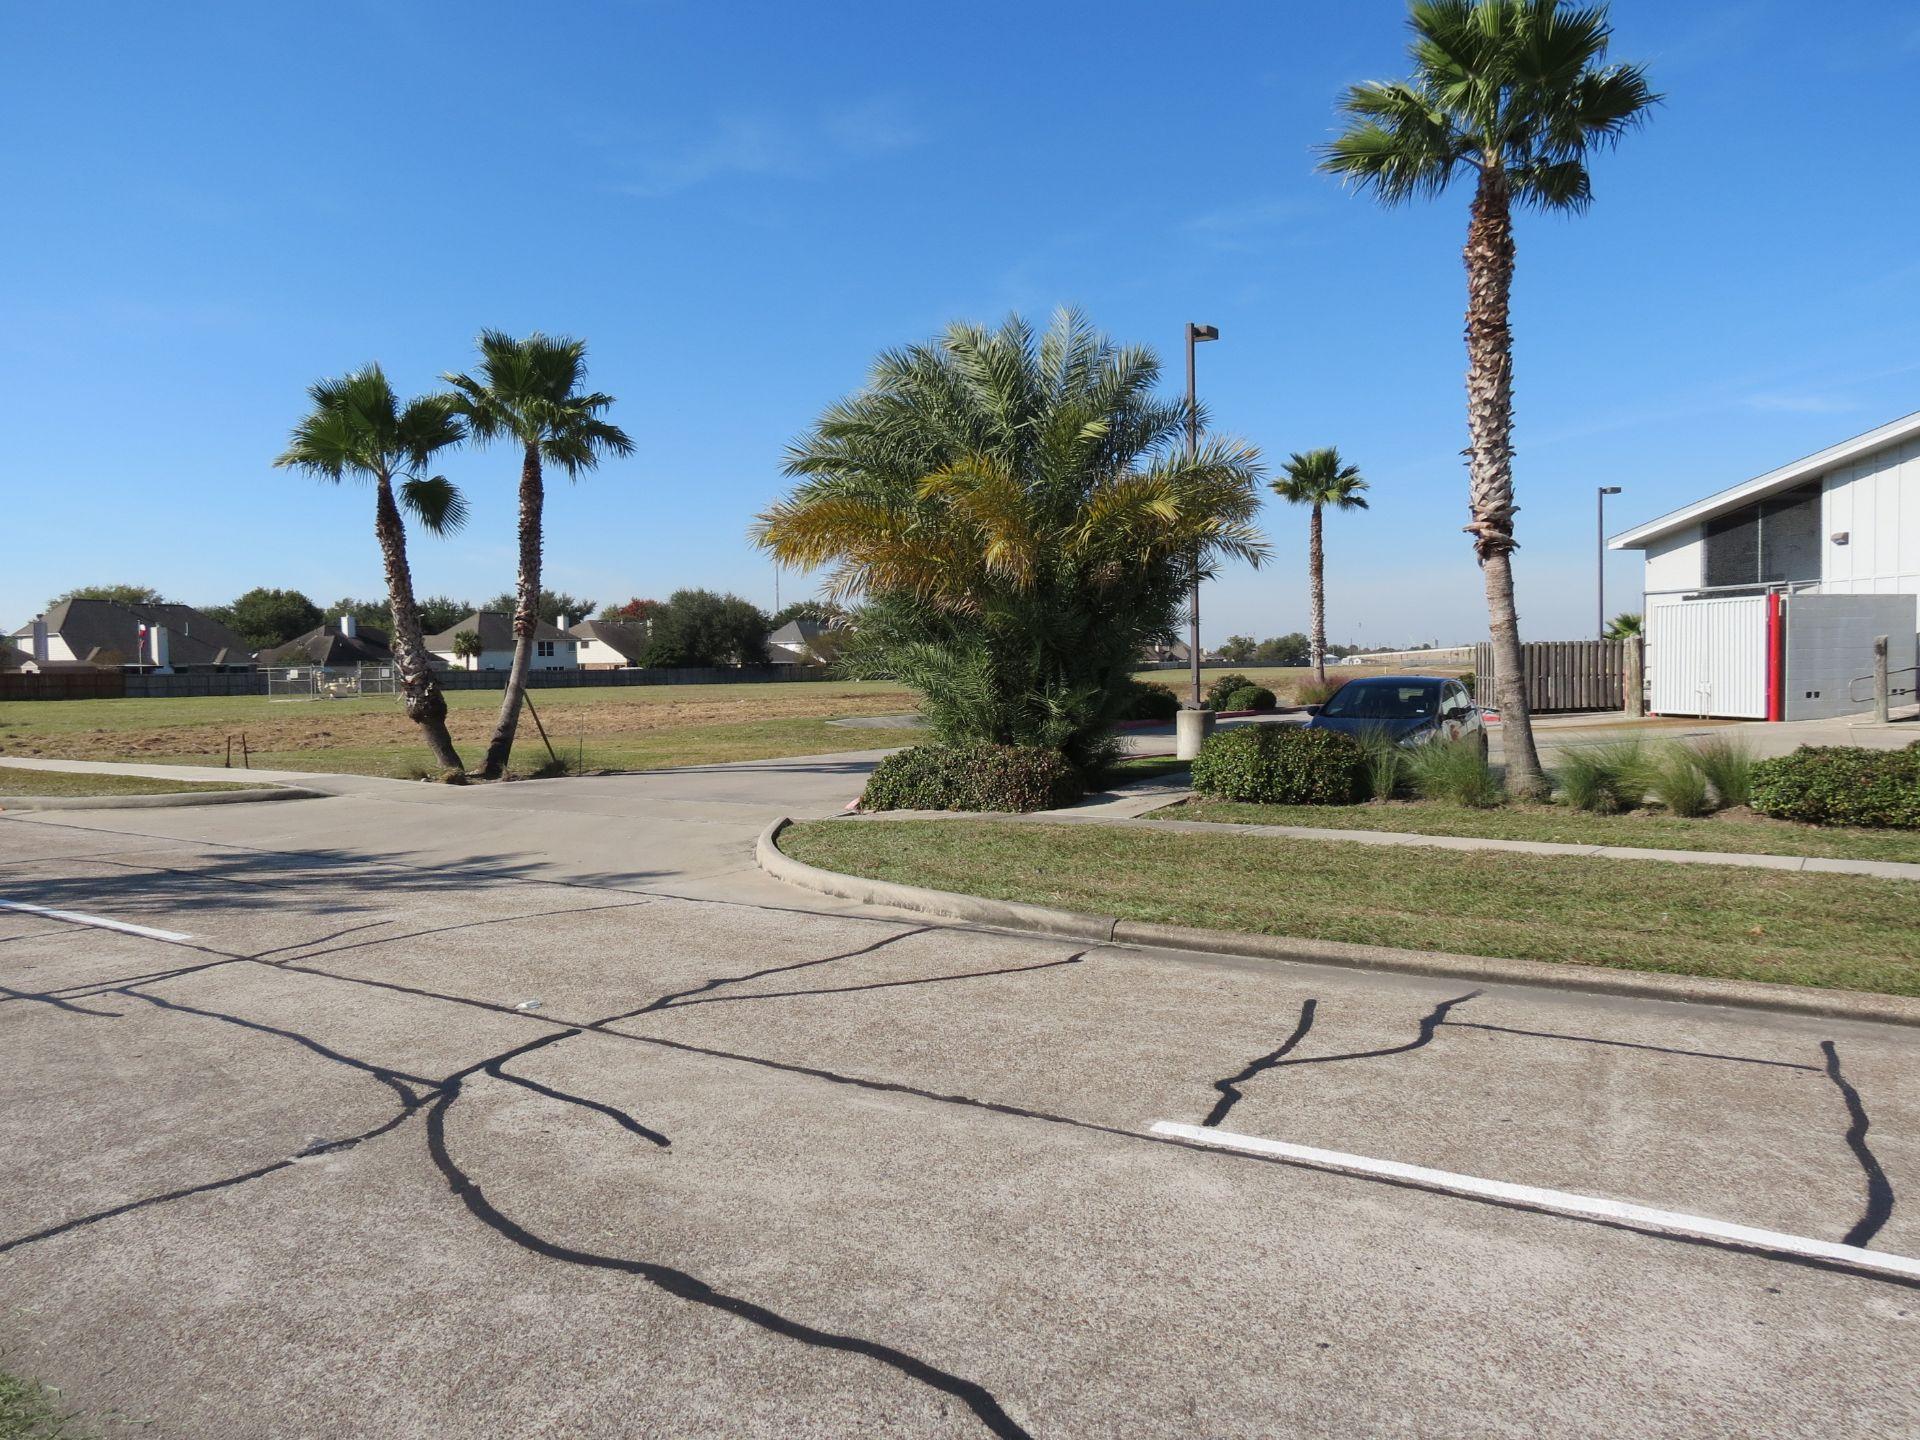 Lot 3 - Commercial Property in Deer Park